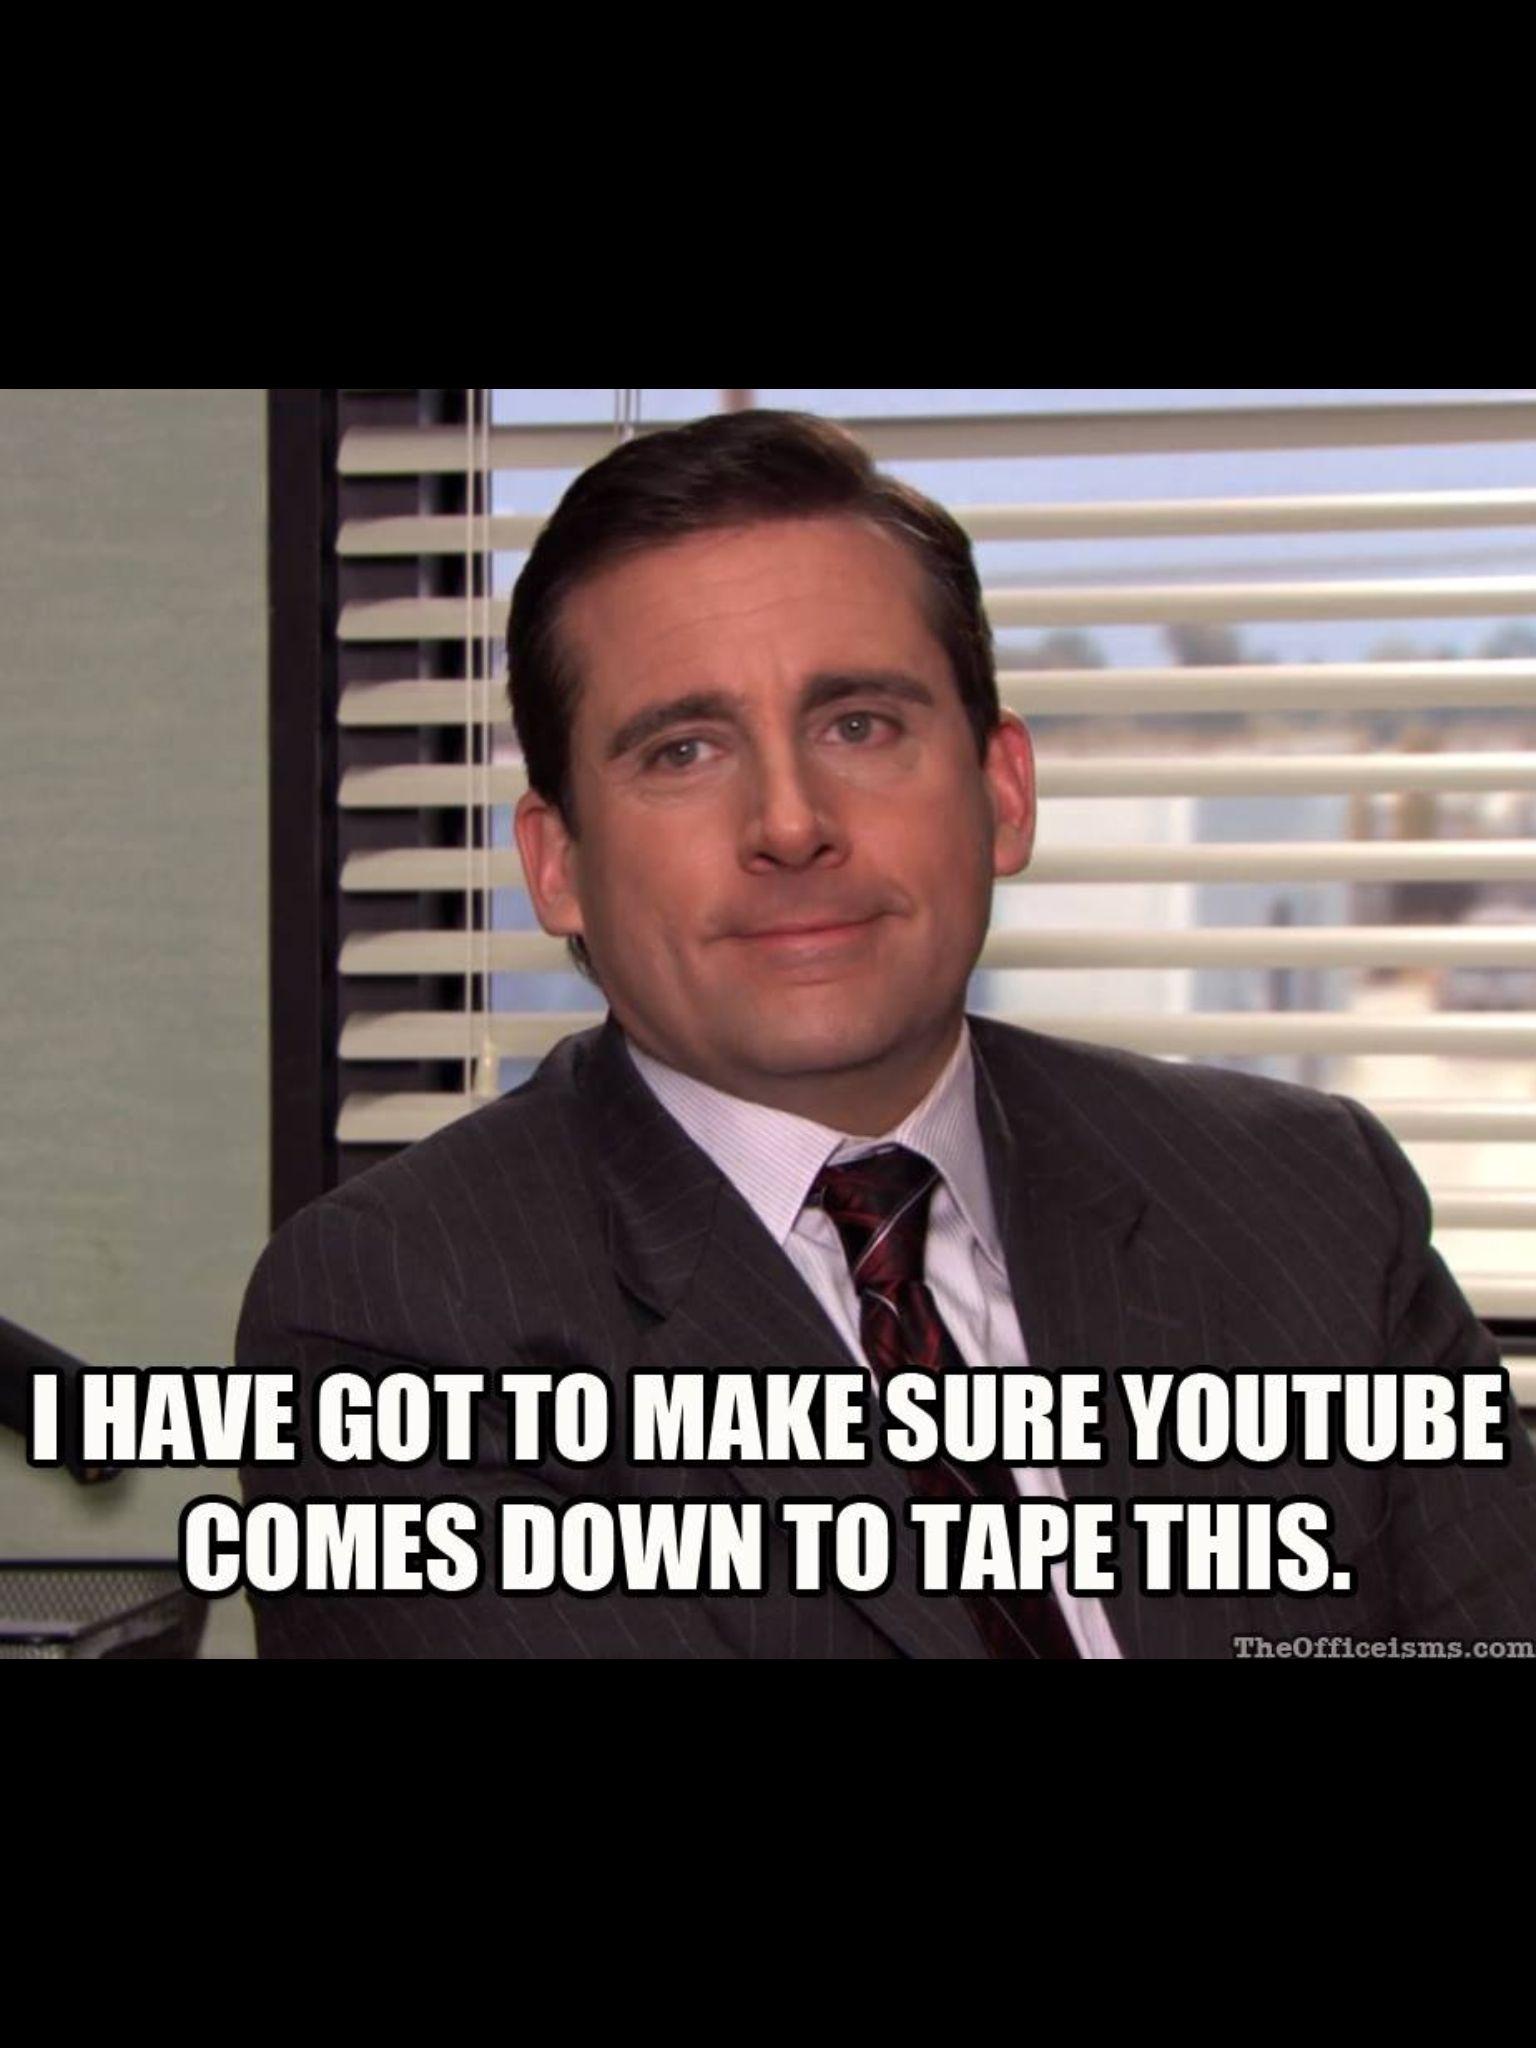 Bosss Day Meme The Office